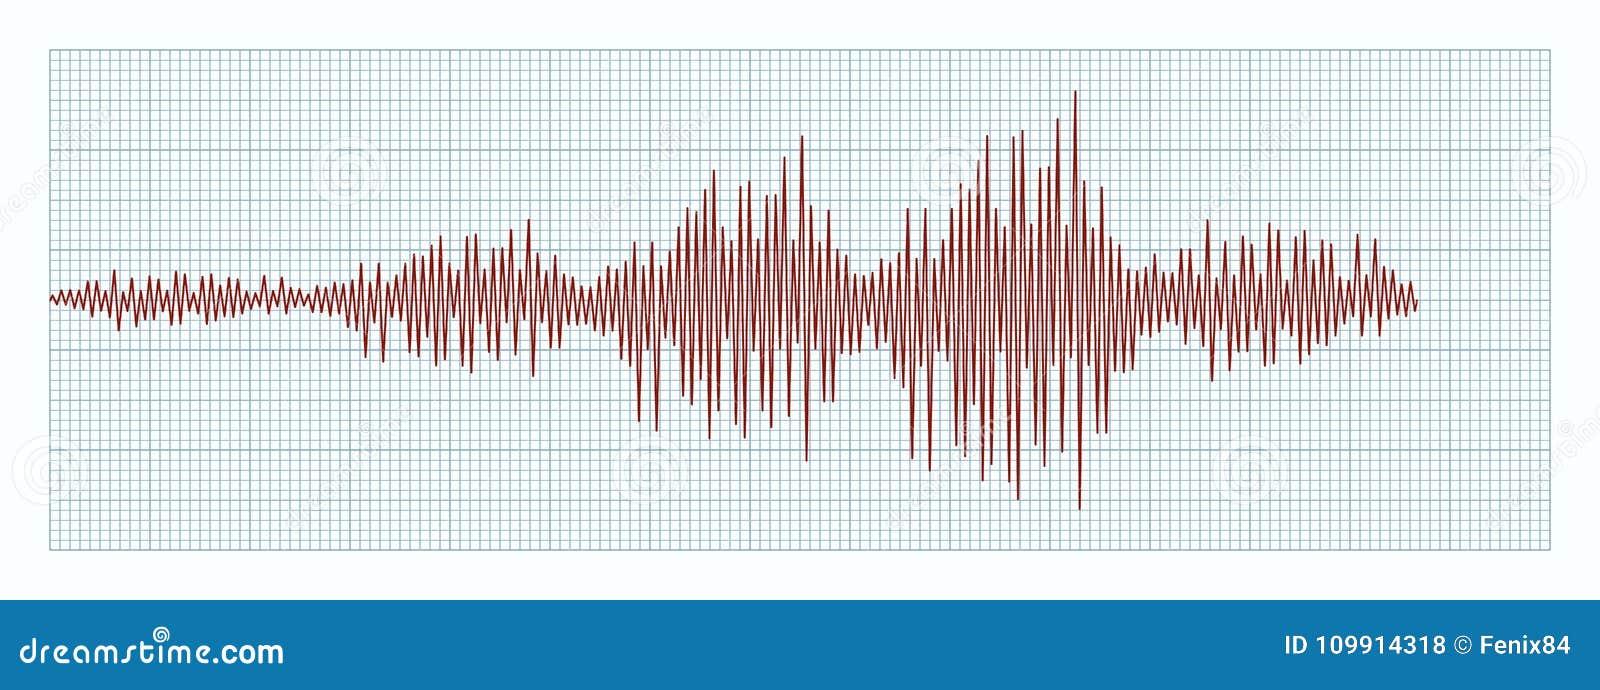 diagram earthquakes concept seismic activity seismogram graph earthquake paper tape vector record seismograph shows 109914318 diagram of earthquakes, concept of seismic activity stock vector